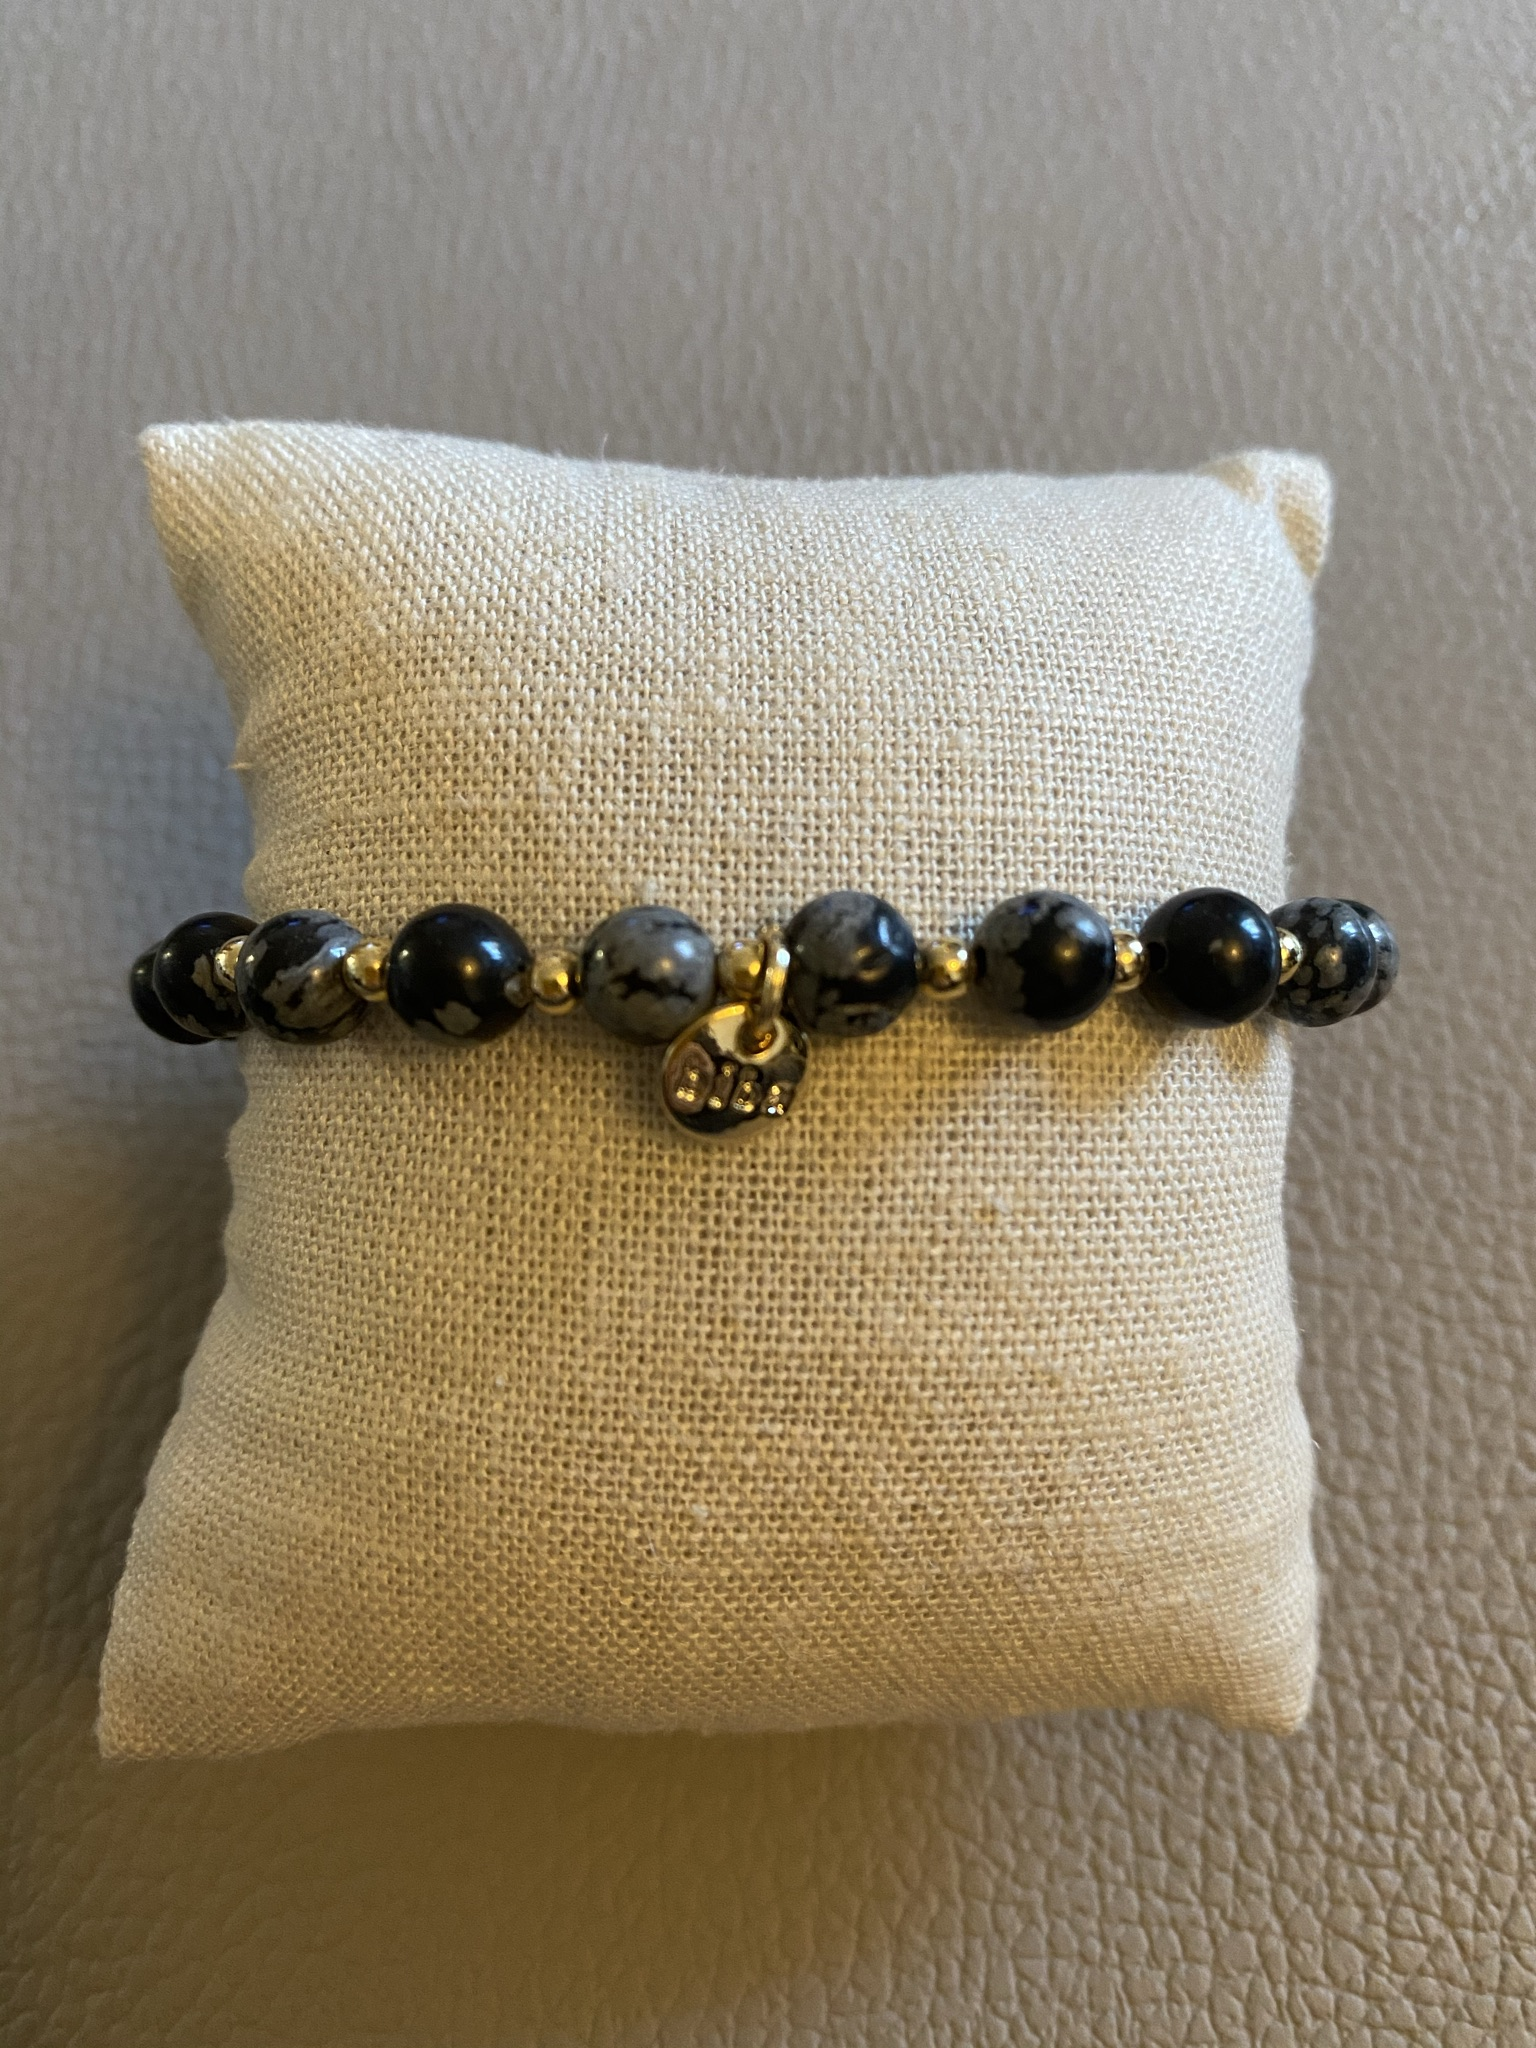 Biba Armband schwarz weiß marmoriert gold